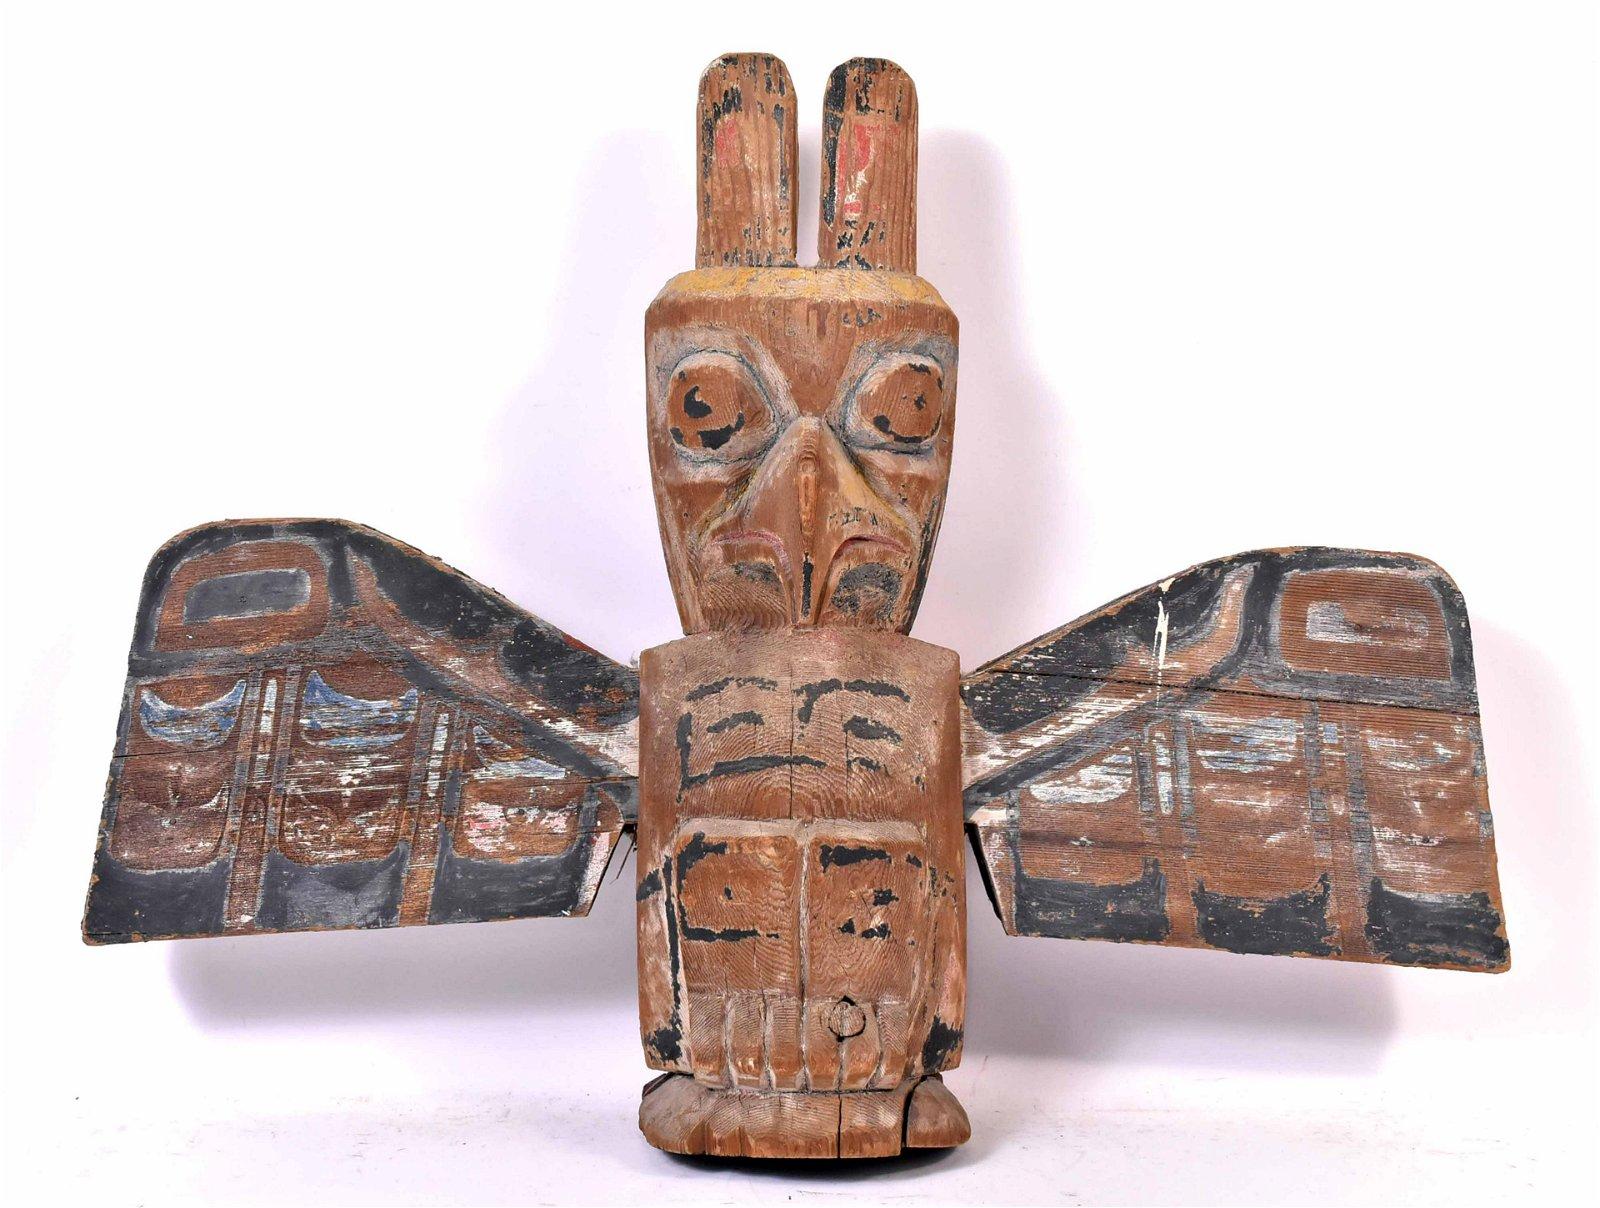 Southern Northwest Coast Carved Wood Totem Pole